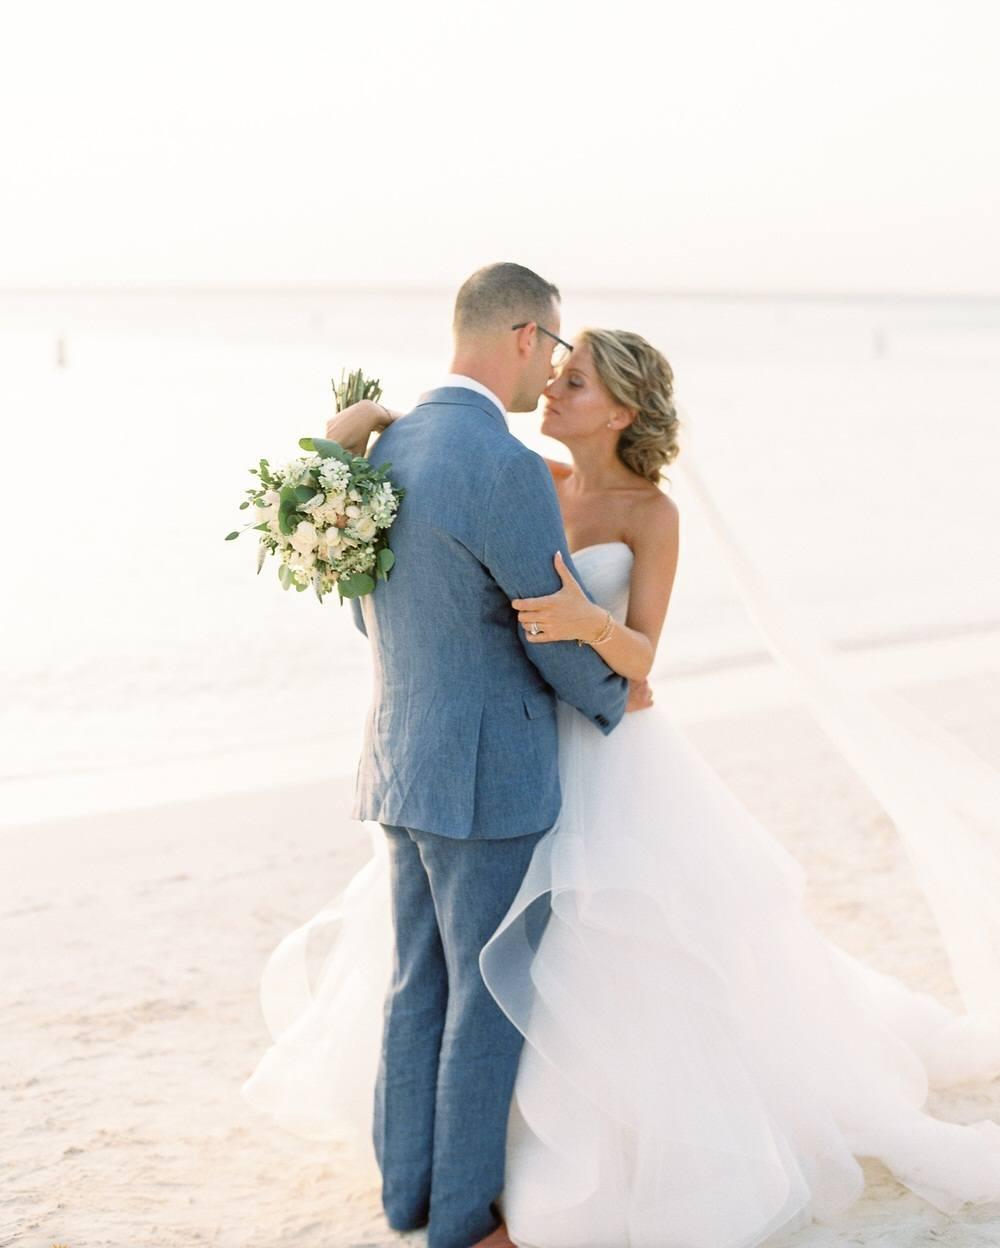 bride and groom wedding portrait at Aruba beach